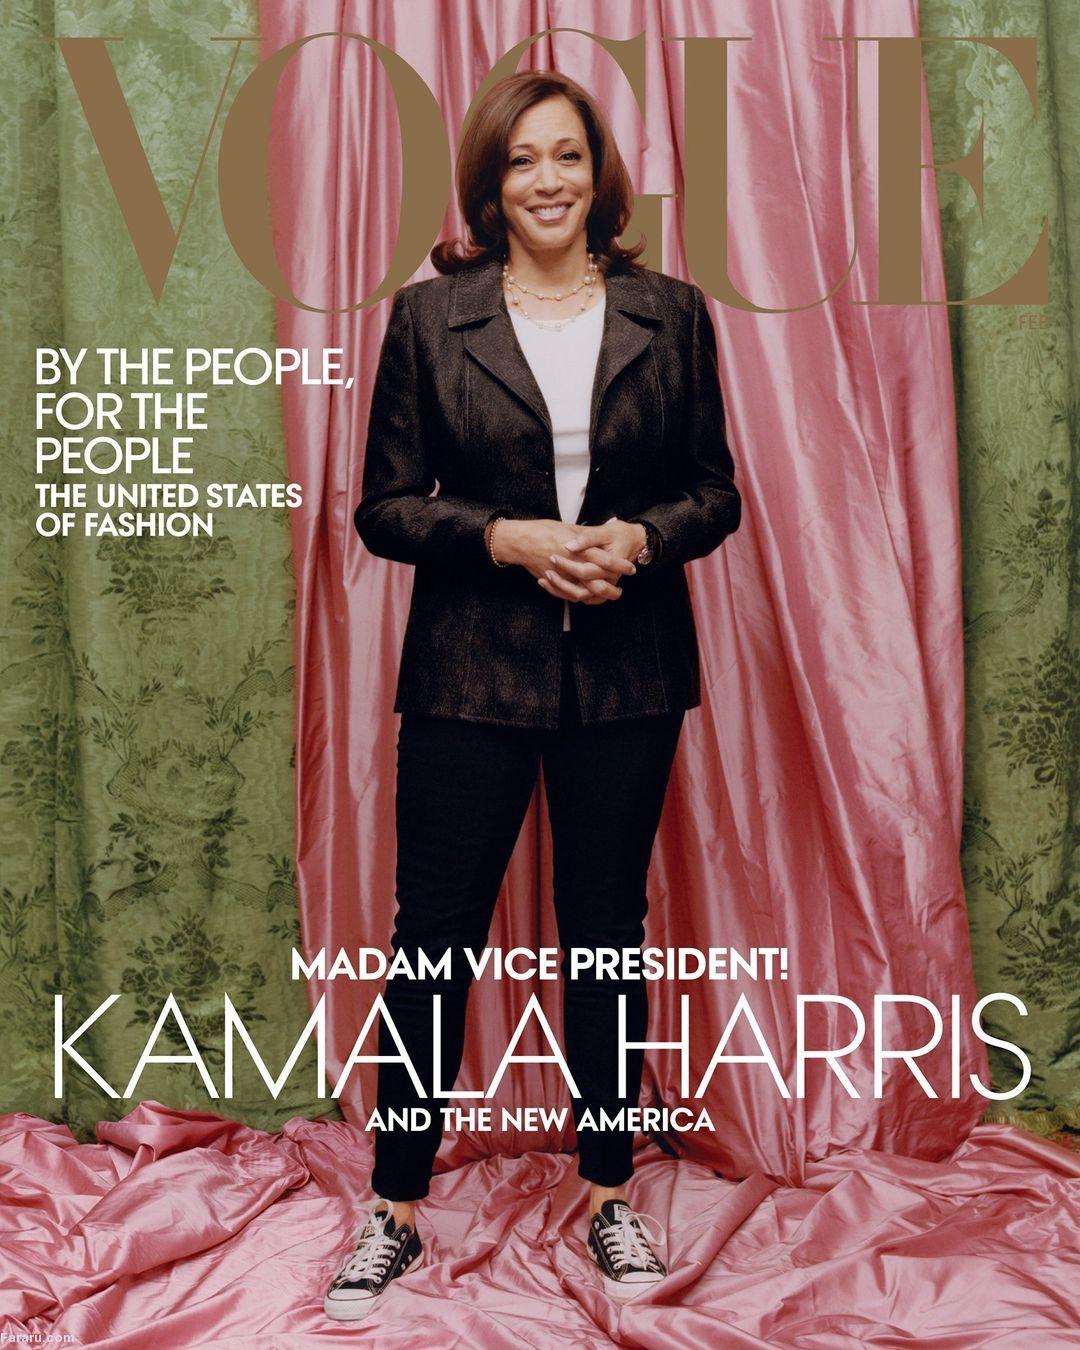 تصویر متفاوت کامالا هریس روی مجله ووگ